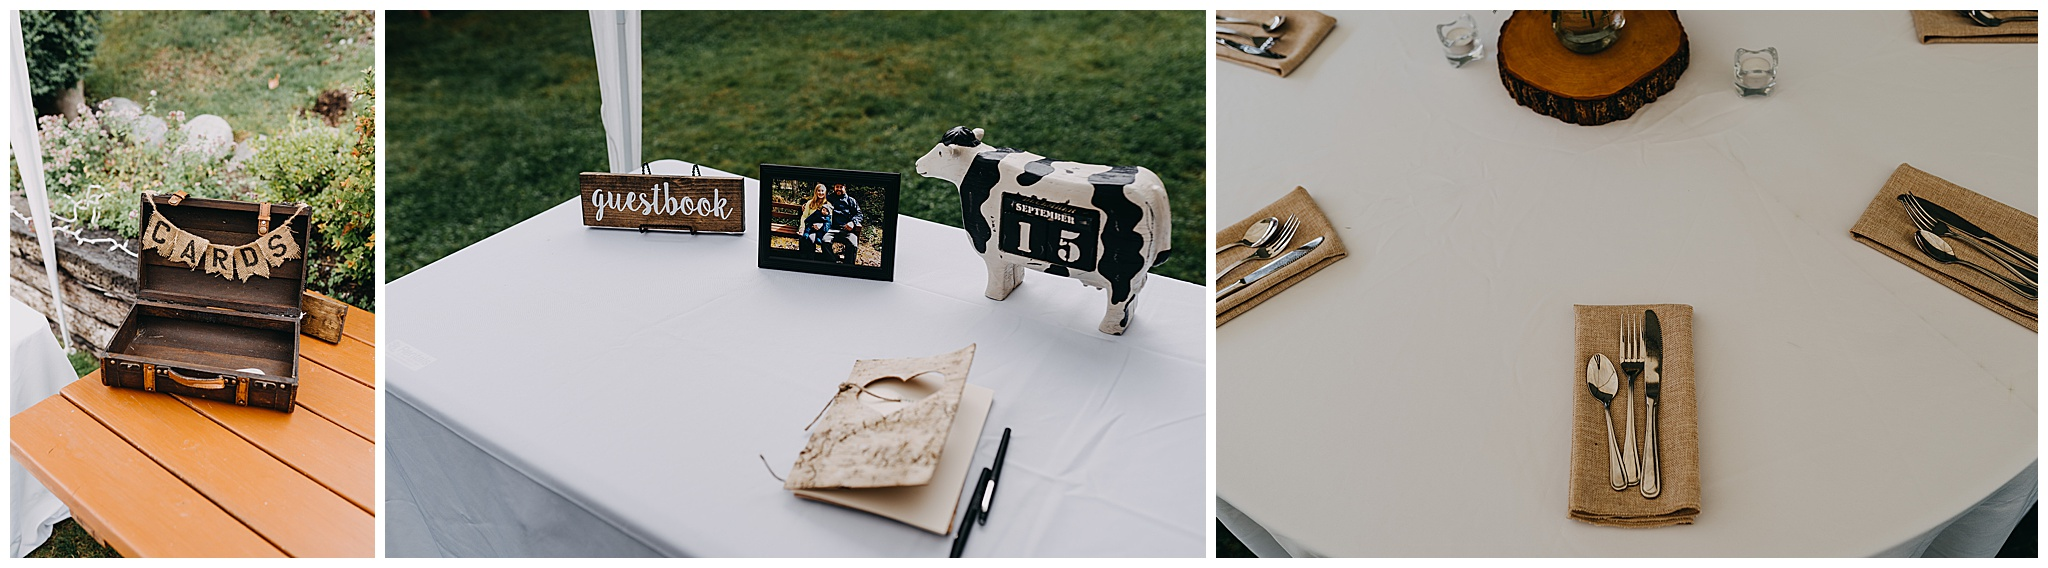 index-wa-wedding2.jpg